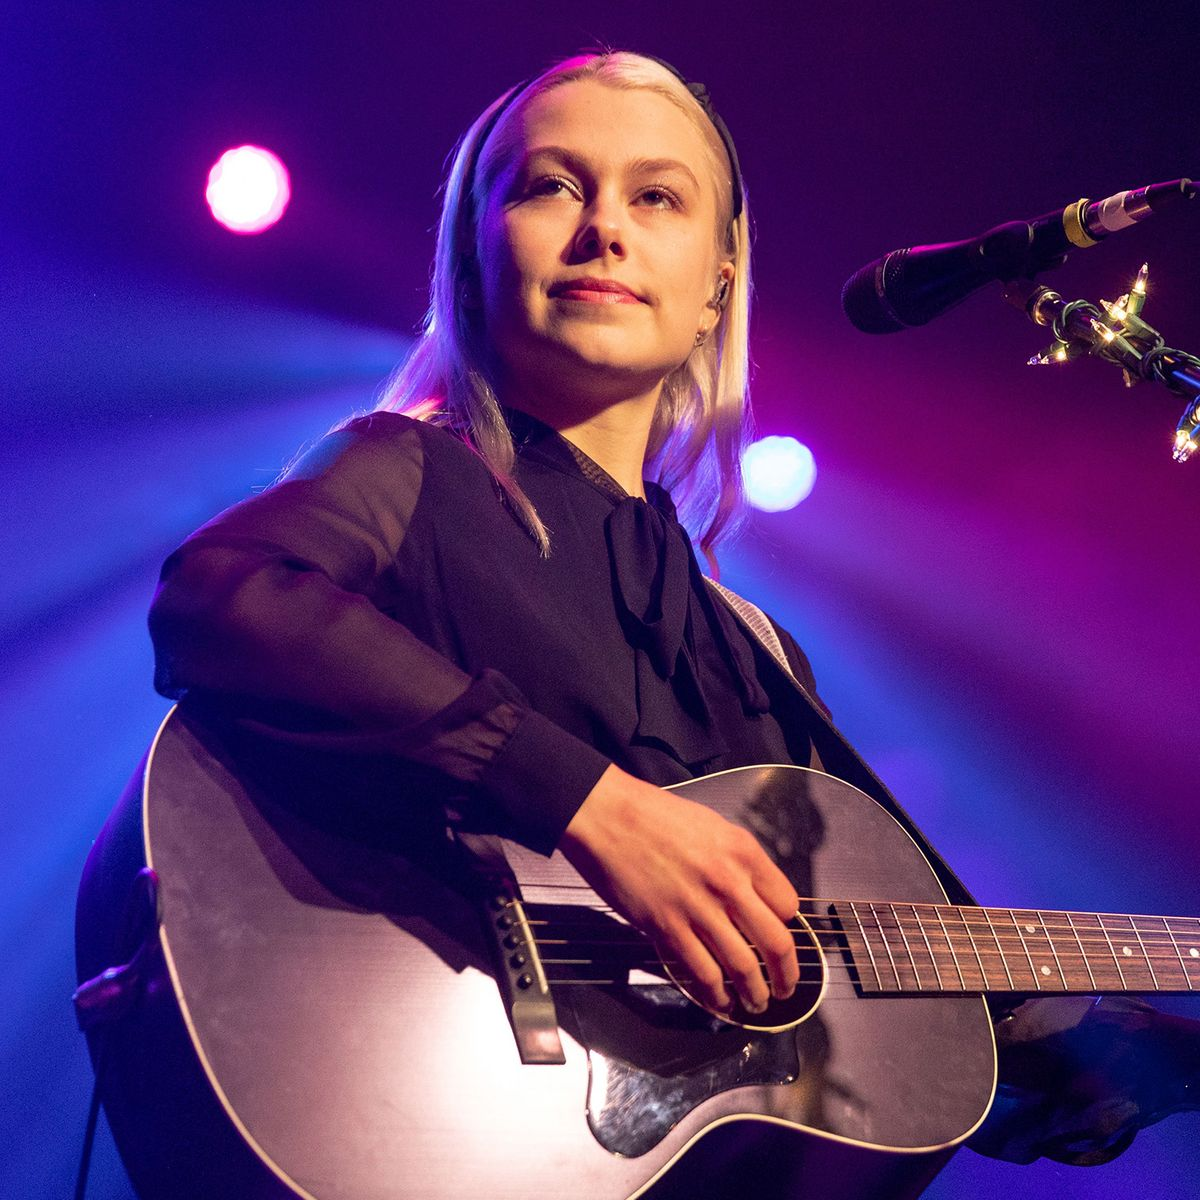 Phoebe Bridgers Releases New Album Punisher Early Listen